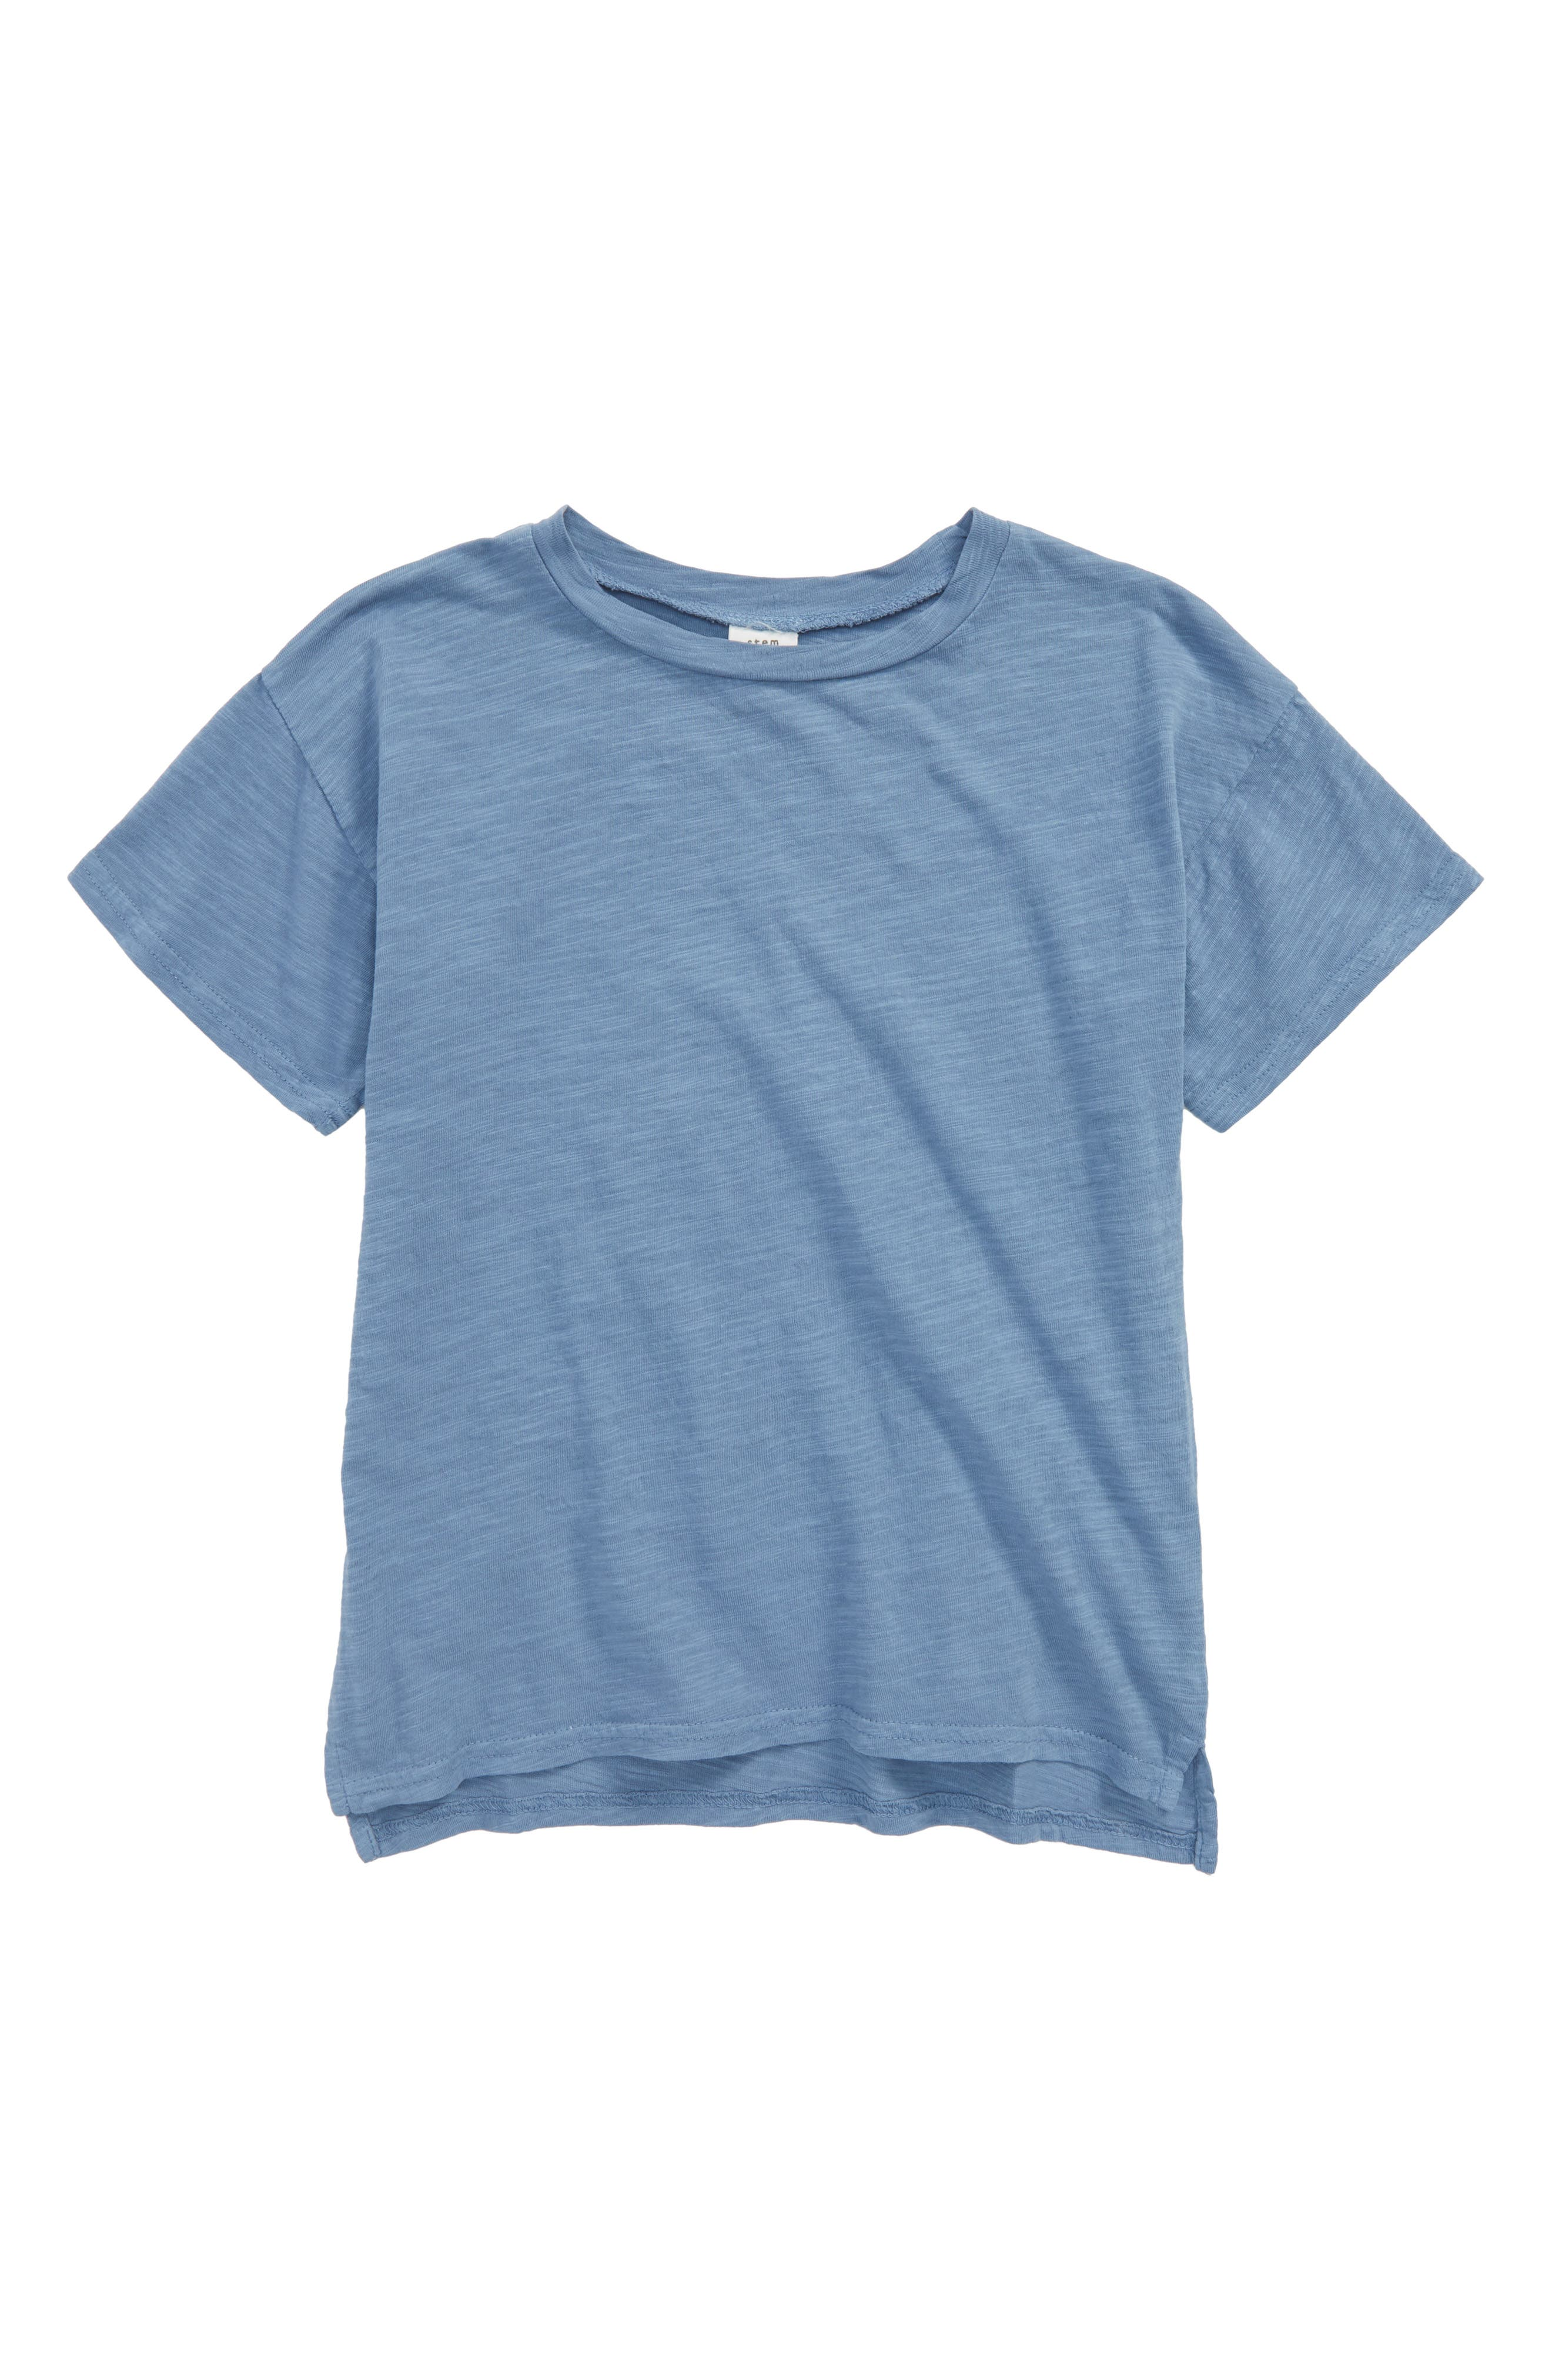 Short Sleeve Cotton T-Shirt,                         Main,                         color, Blue Moonlight